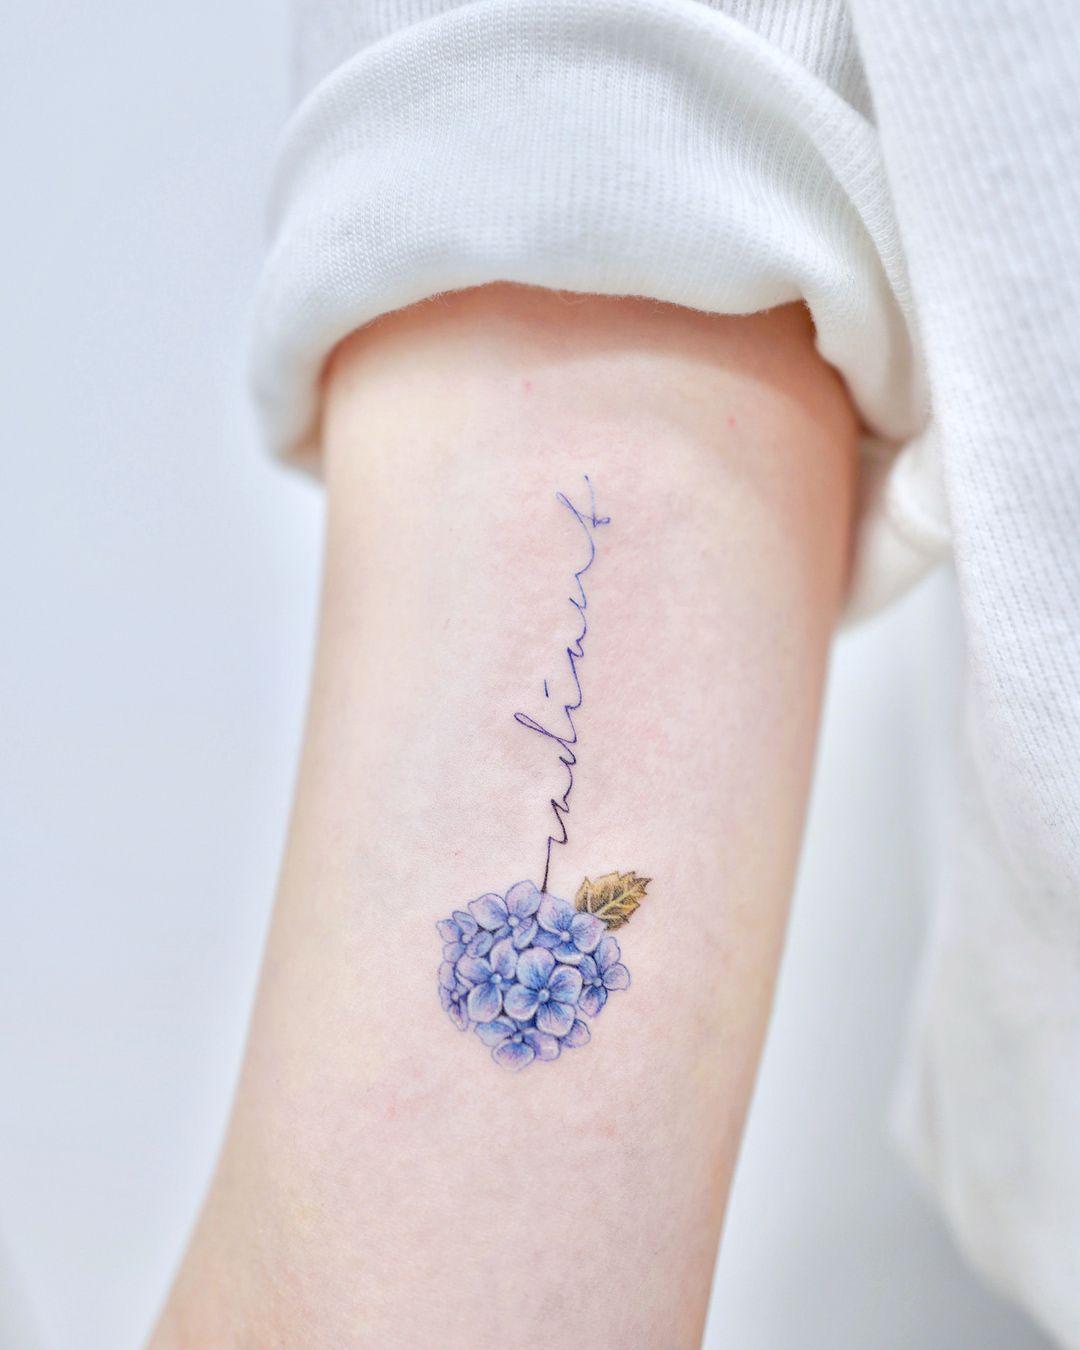 Gefallt 1 061 Mal 22 Kommentare Studiobysol Nemo Nemo Tattoo Auf Instagram Hydrangea And Lettering Radi Tattoos Tattoos For Women Tattoos For Daughters